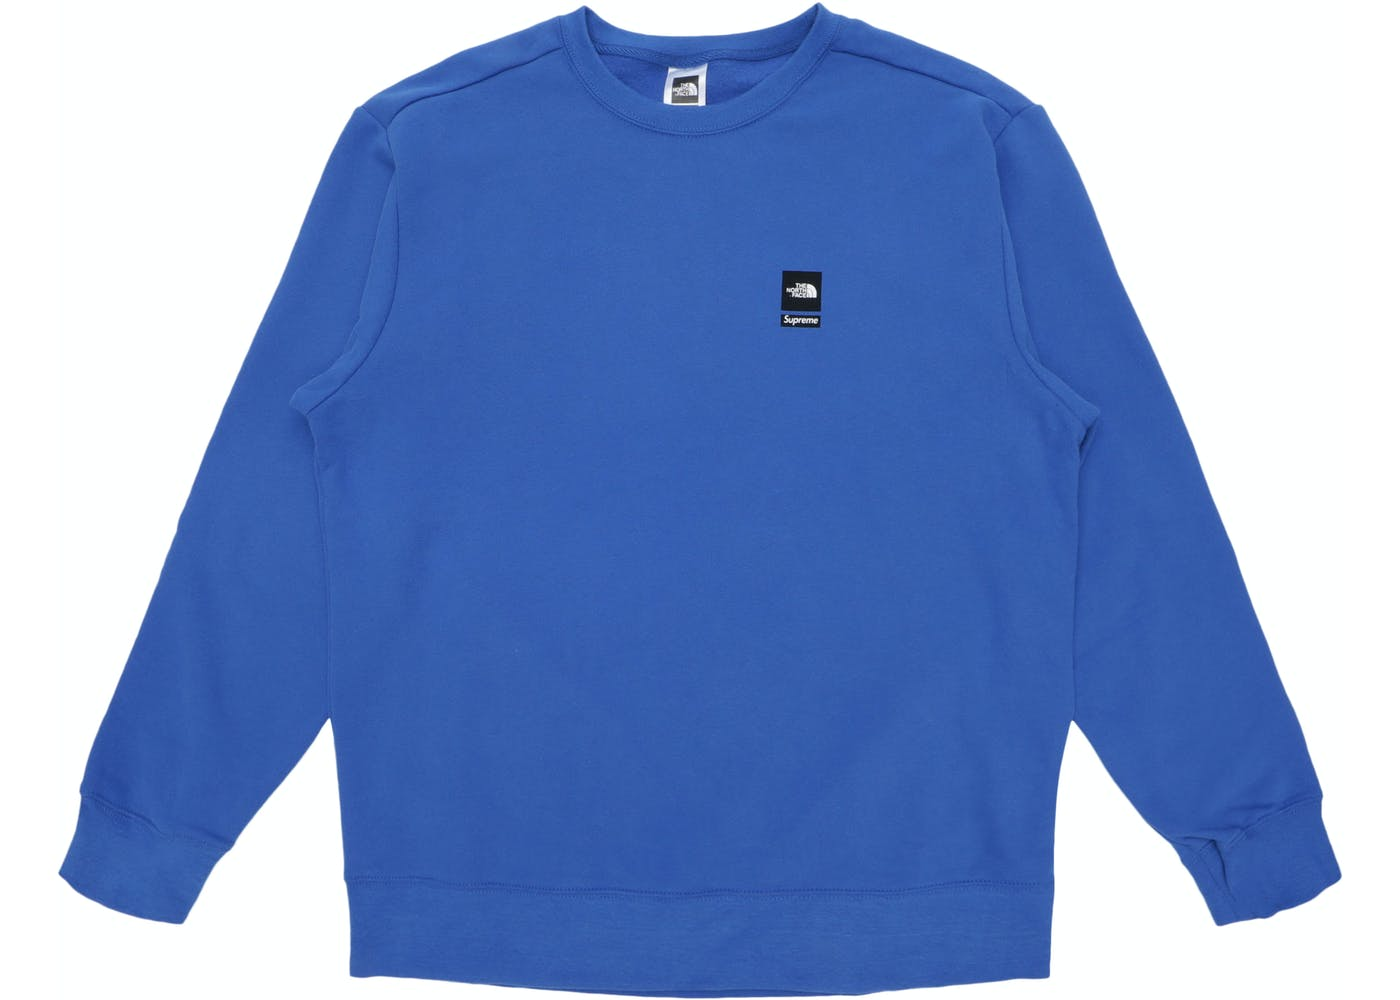 The North Face Mountain Crewneck Sweatshirt Royal